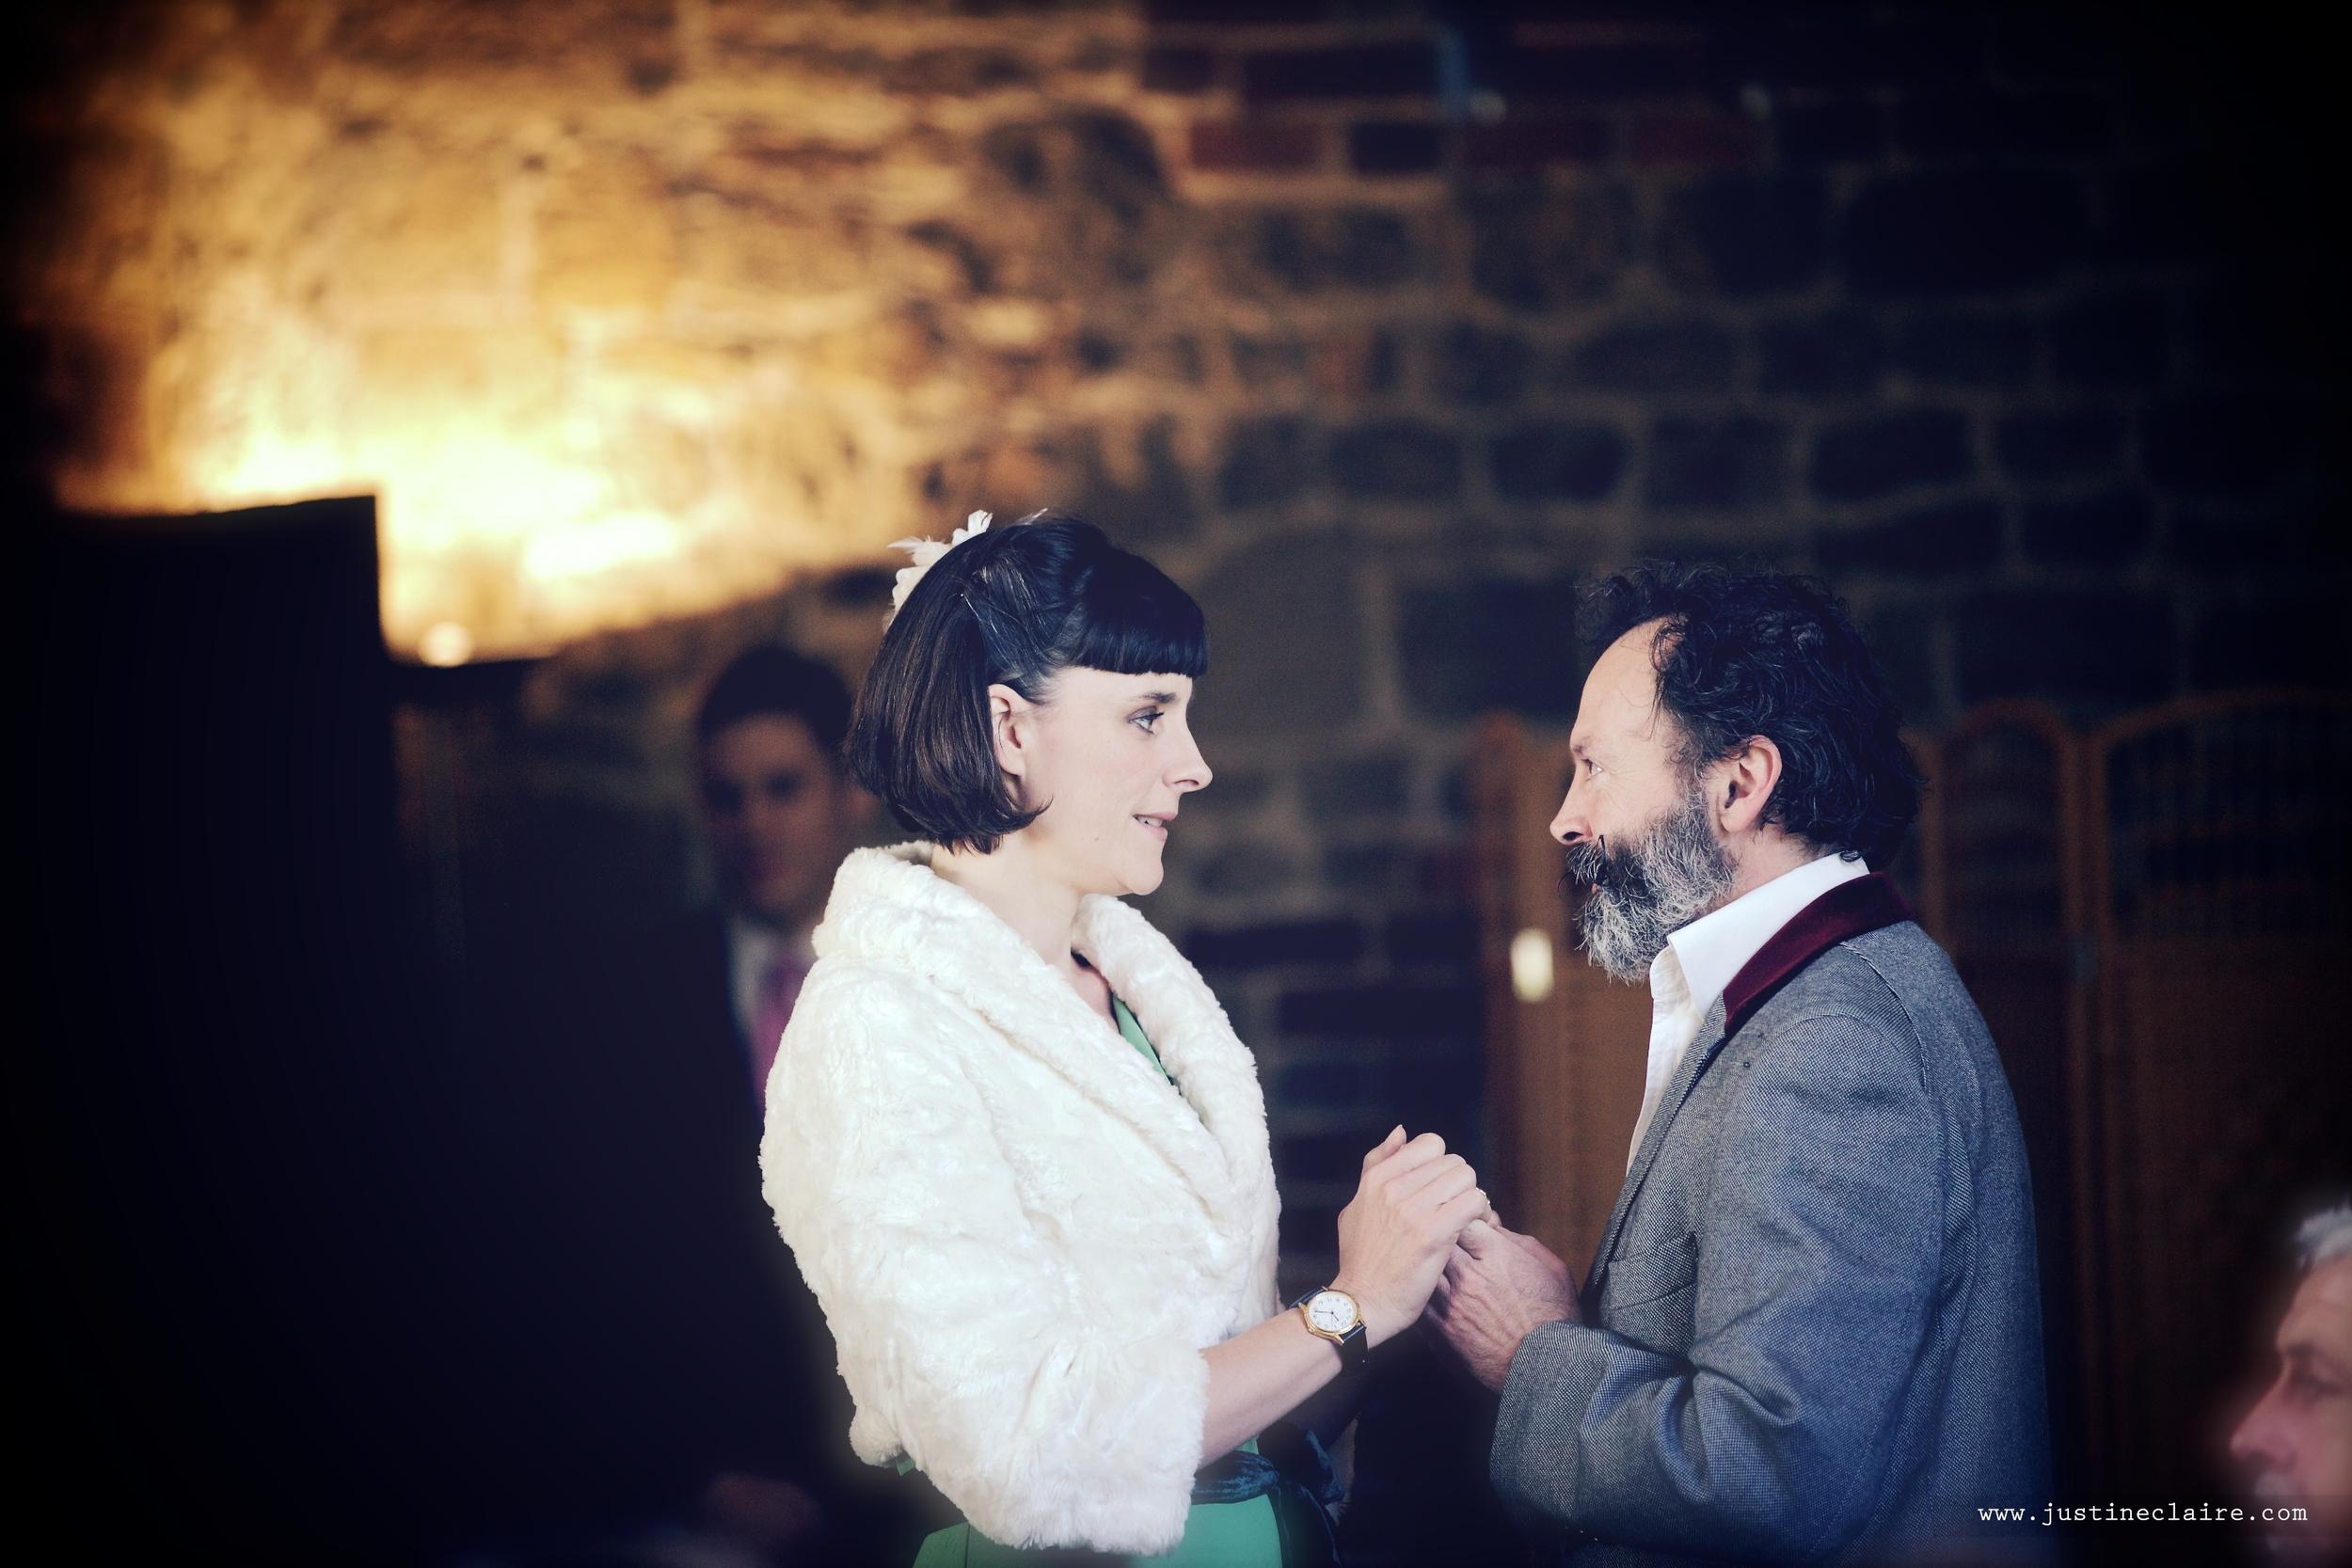 Imogen and Jack - sing - www.imaginejack.com